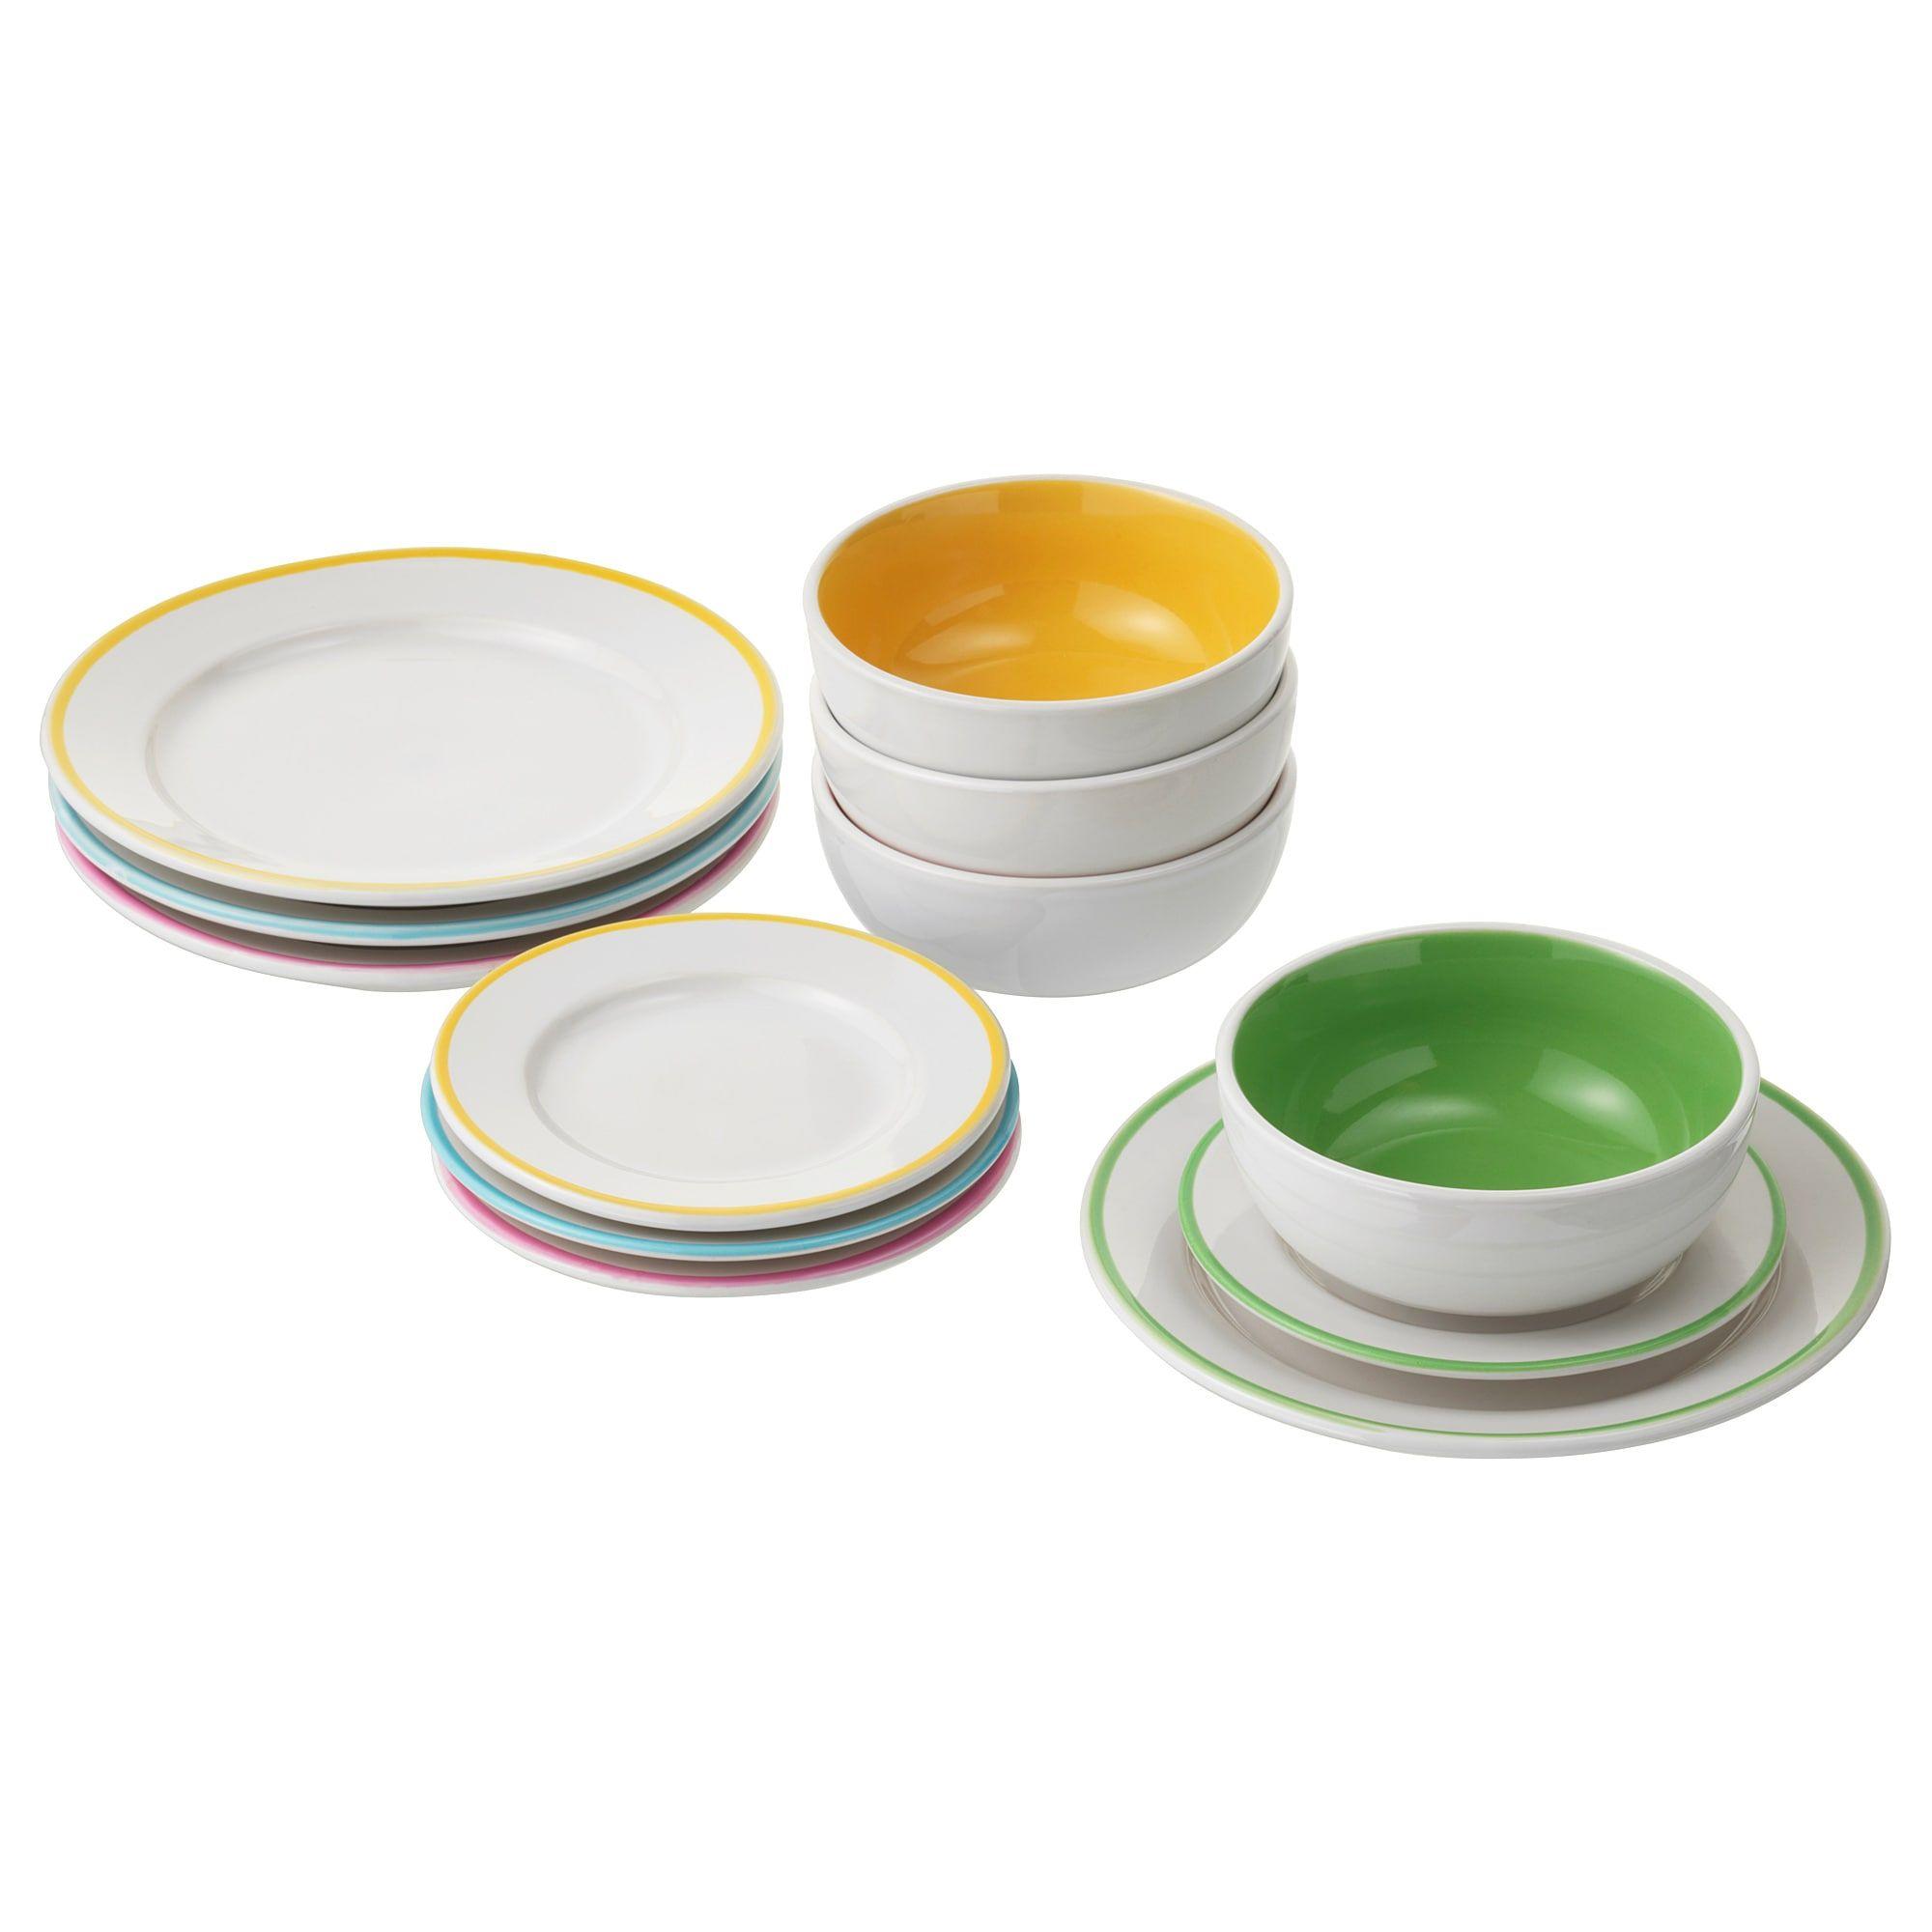 DUKTIG Plate/bowl Ikea, Toy kitchen set, Toy kitchen